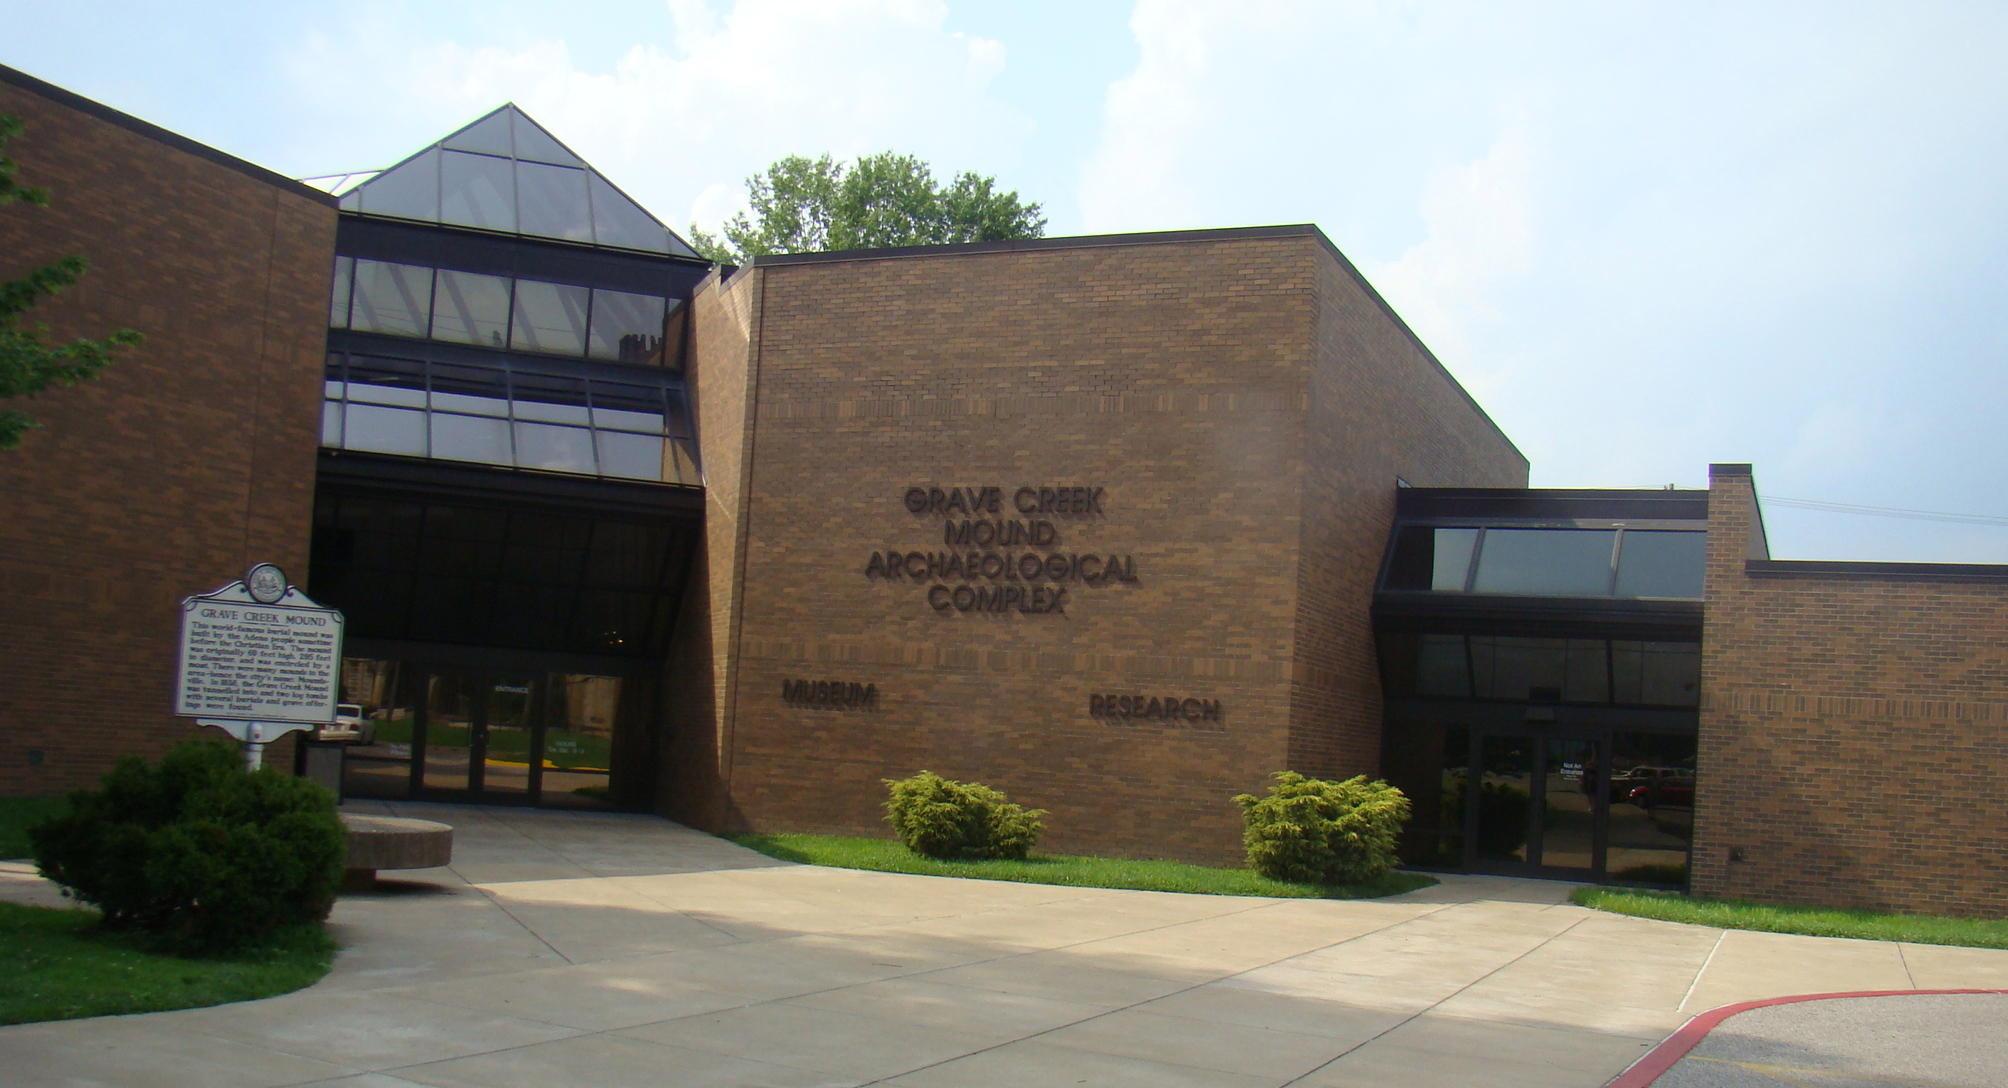 Grave Creek Archeological Center in Moundsville, WV